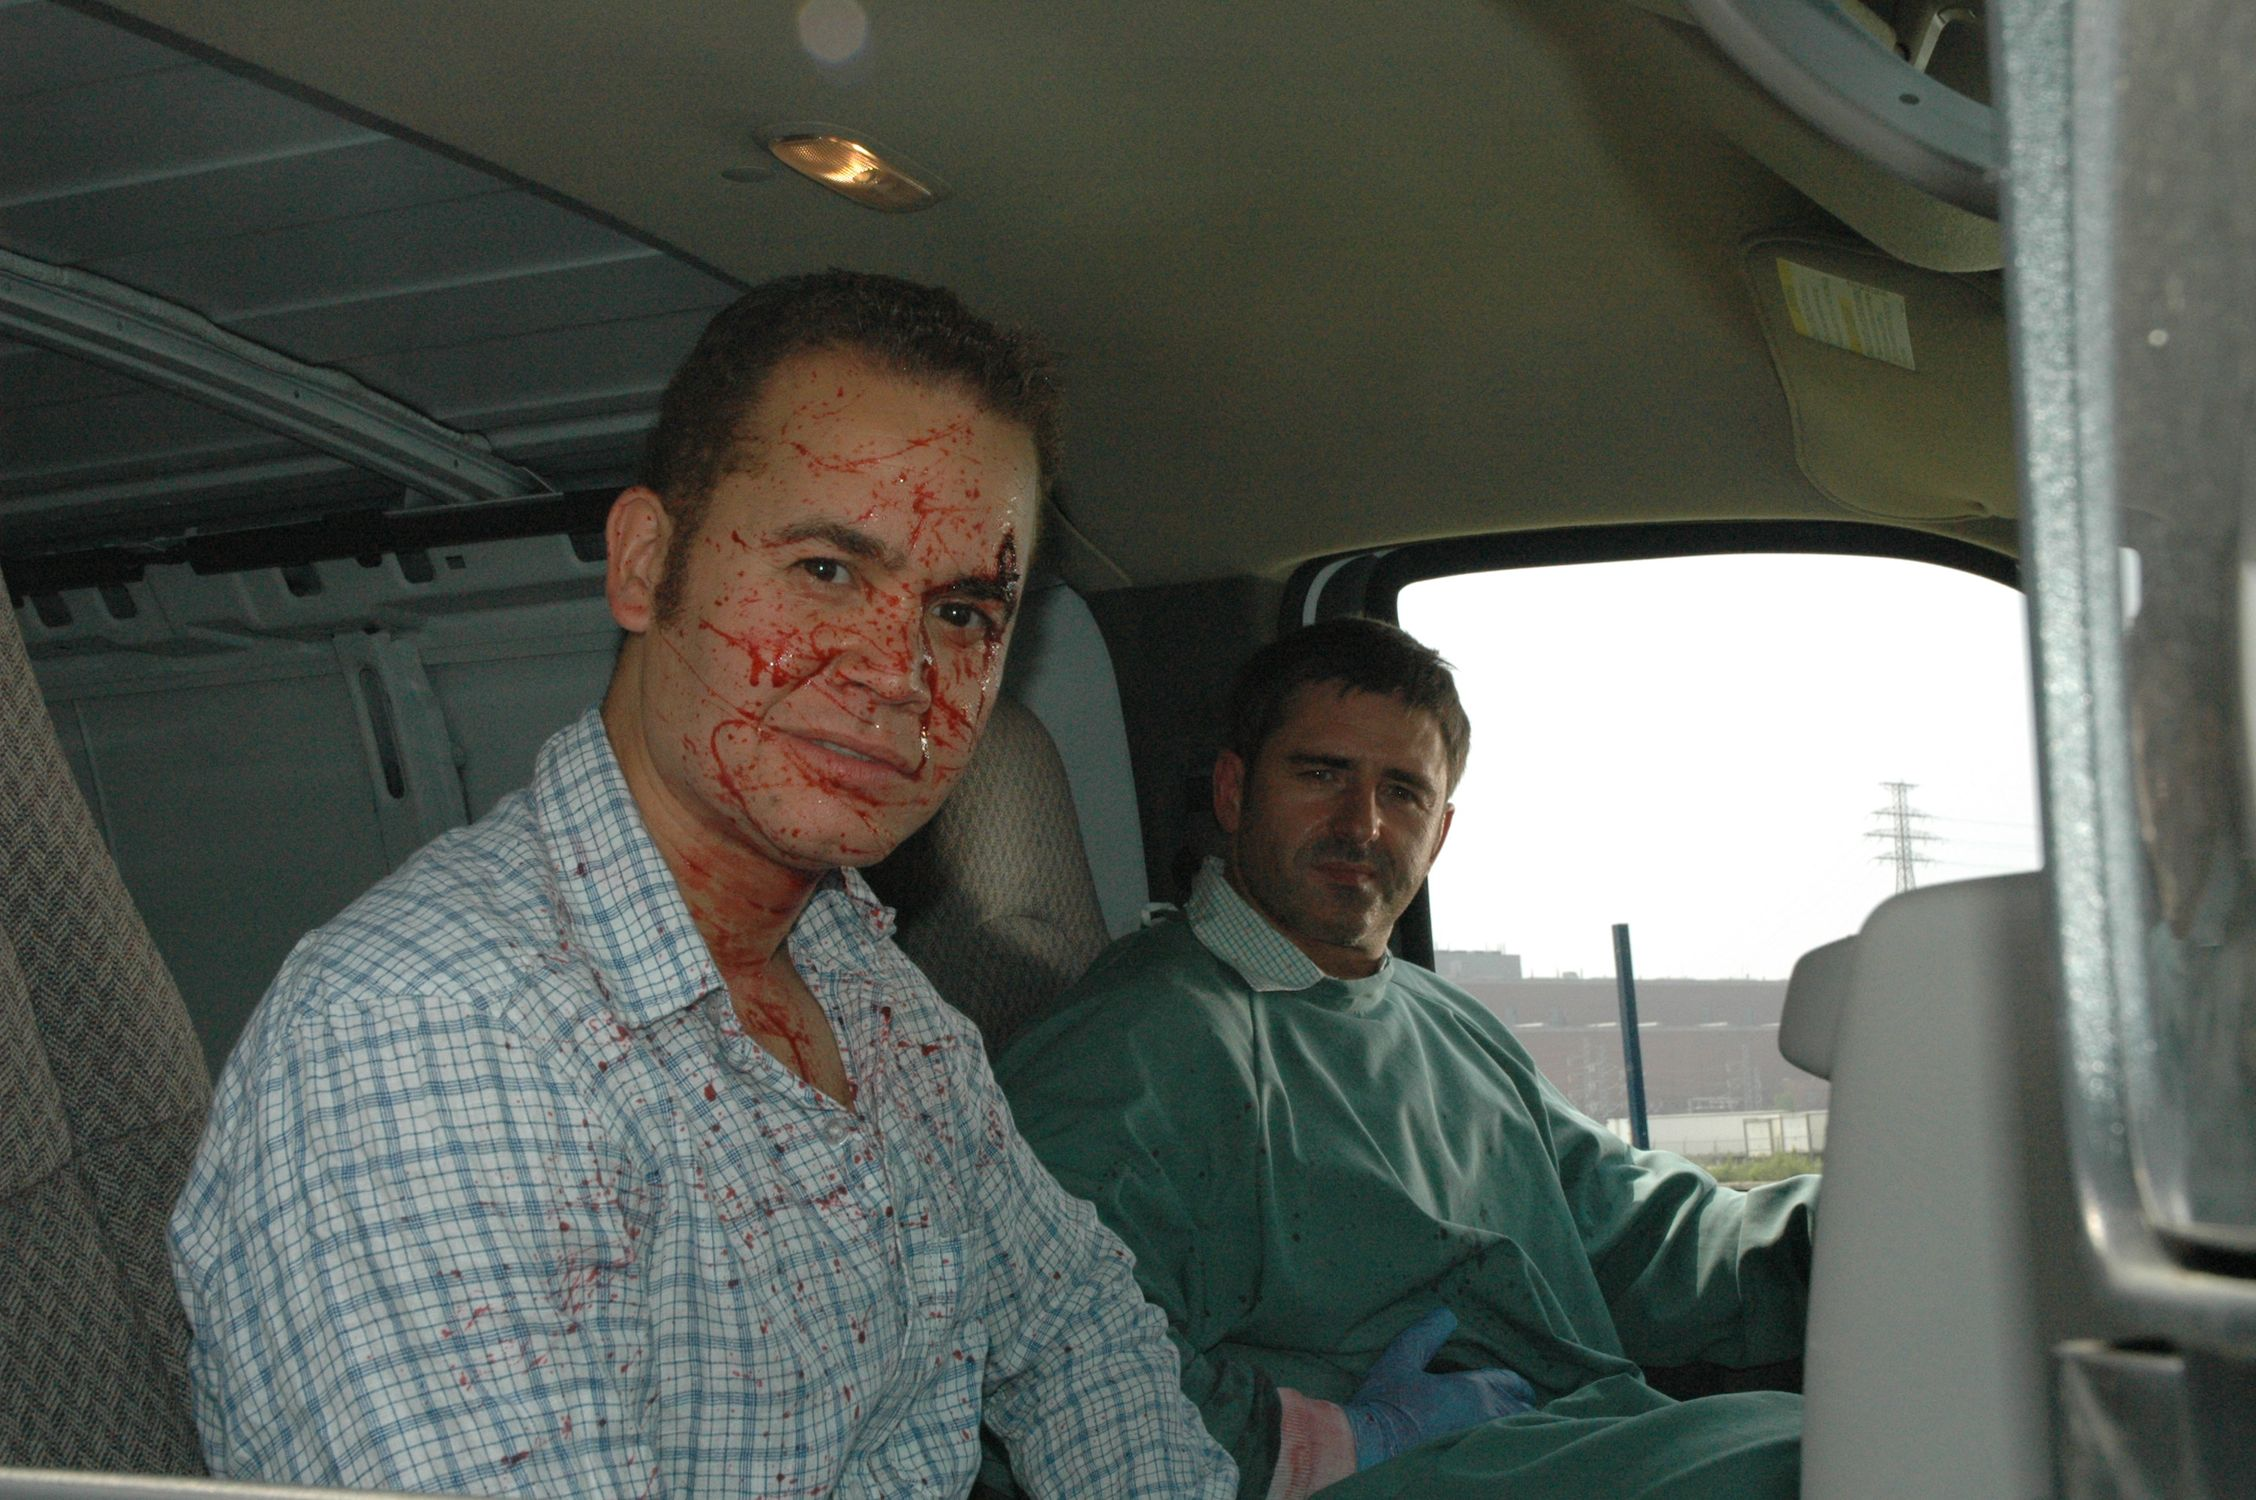 Anthony Greene & Brad Siciliano ham it up between takes